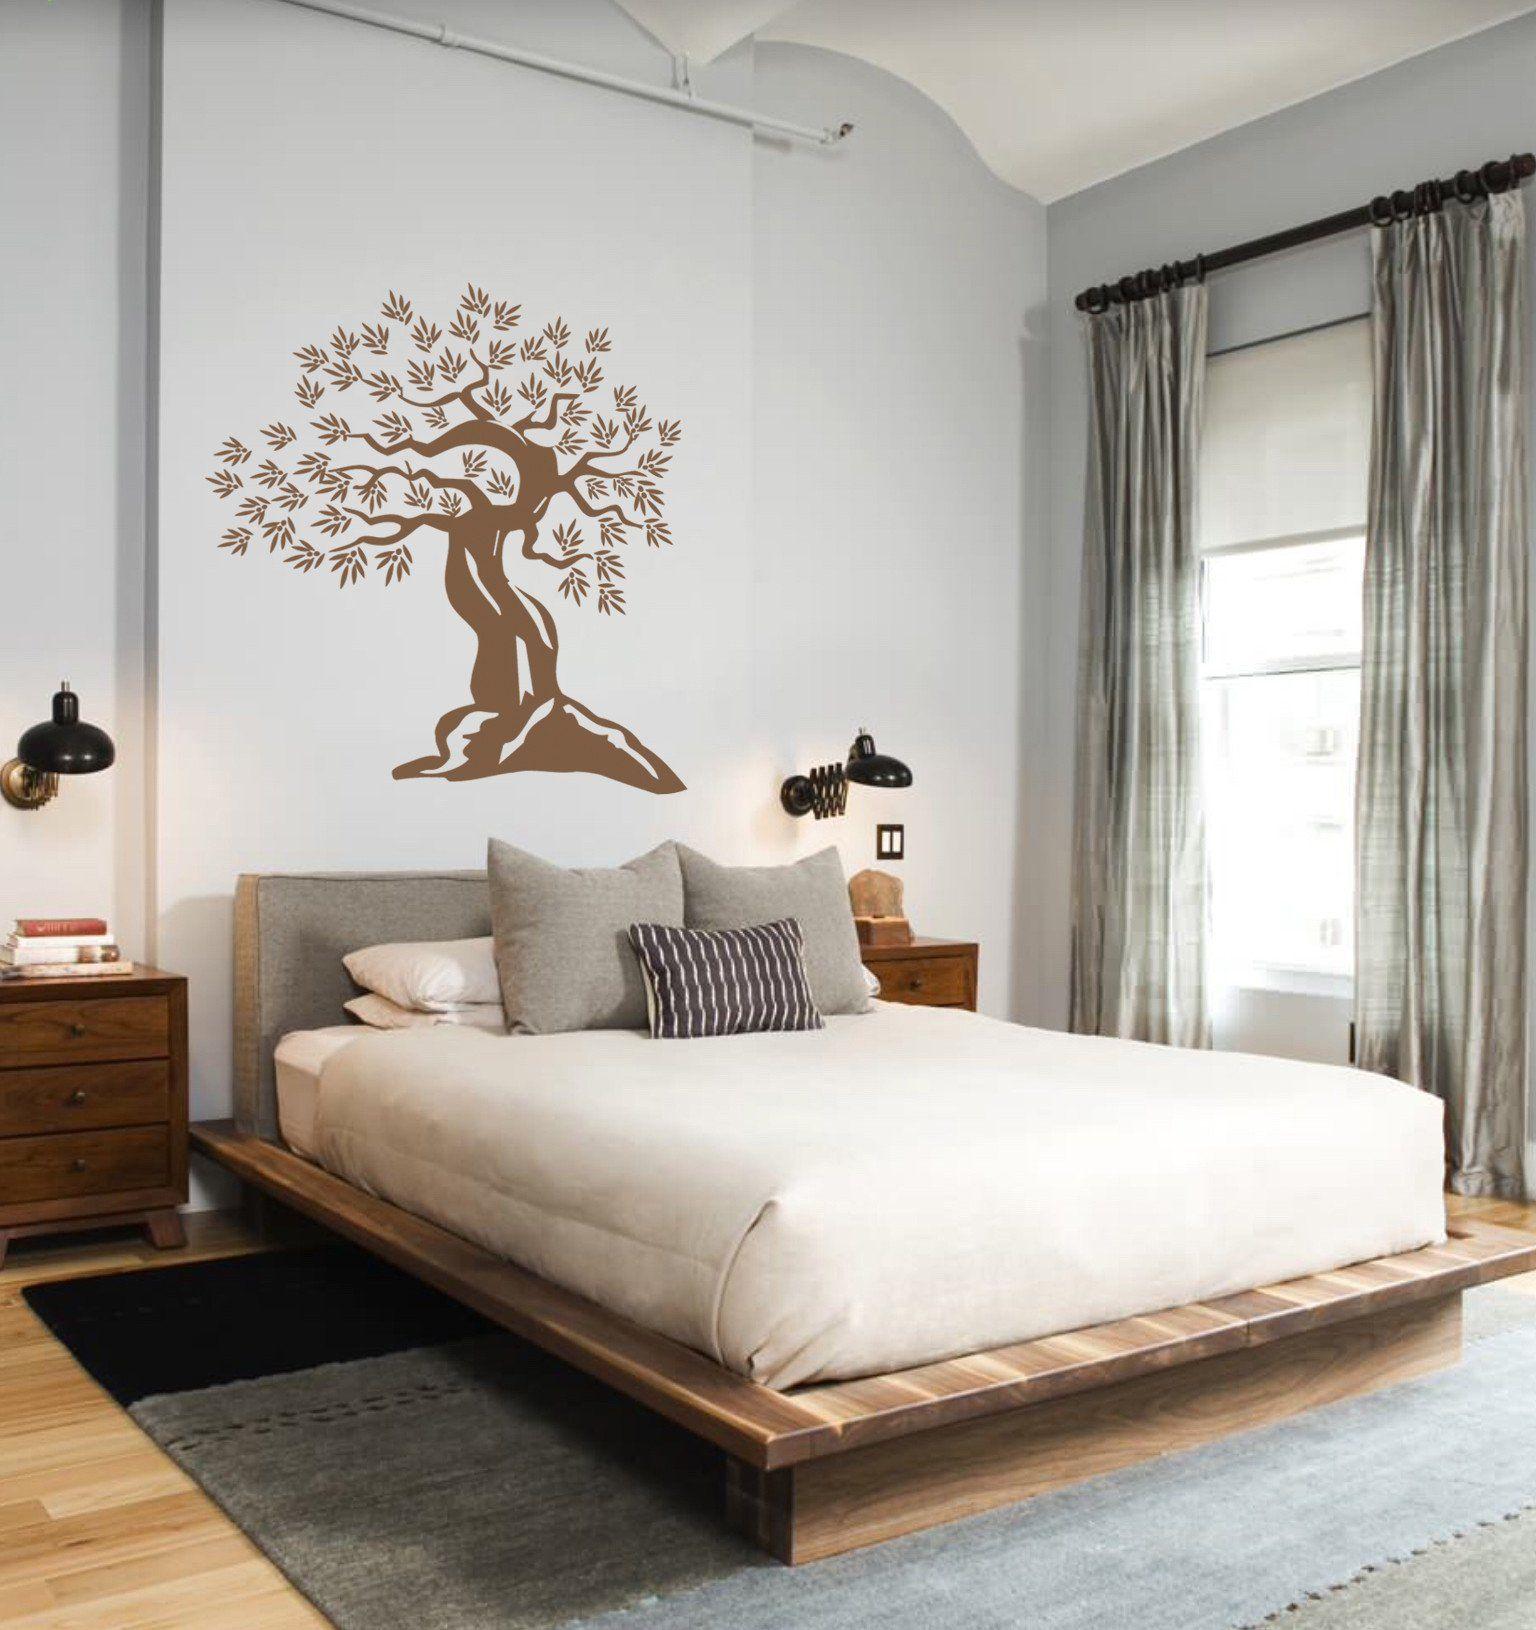 Best Ik311 Wall Decal Sticker Decor Old Olive Tree Bedroom Kids 400 x 300